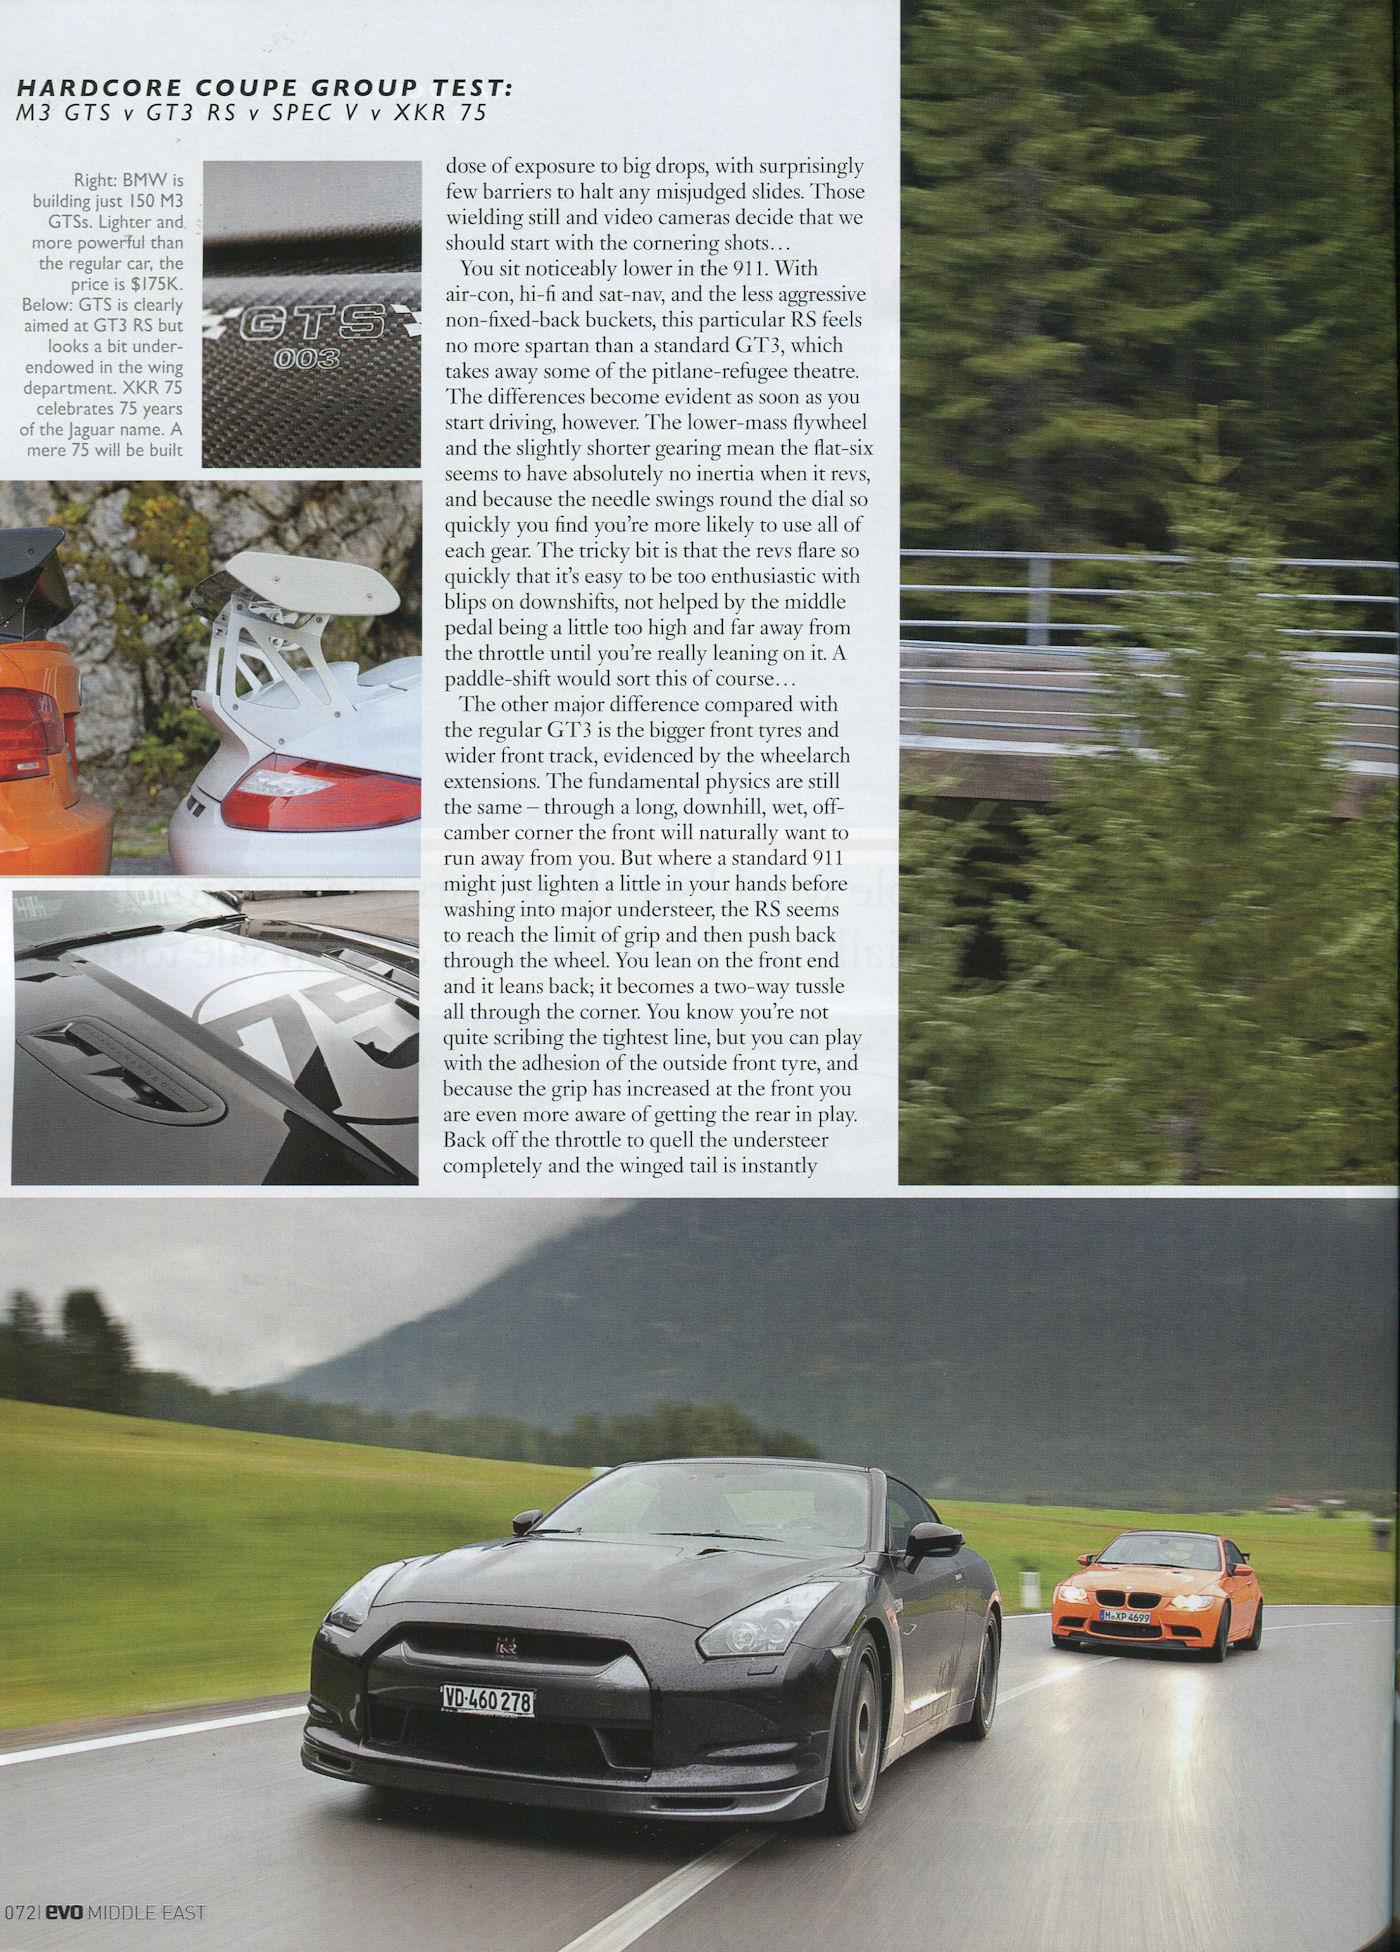 Porsche 997 GT3 RS Mk II vs Nissan GTR vs BMW M3 GTS vs ...